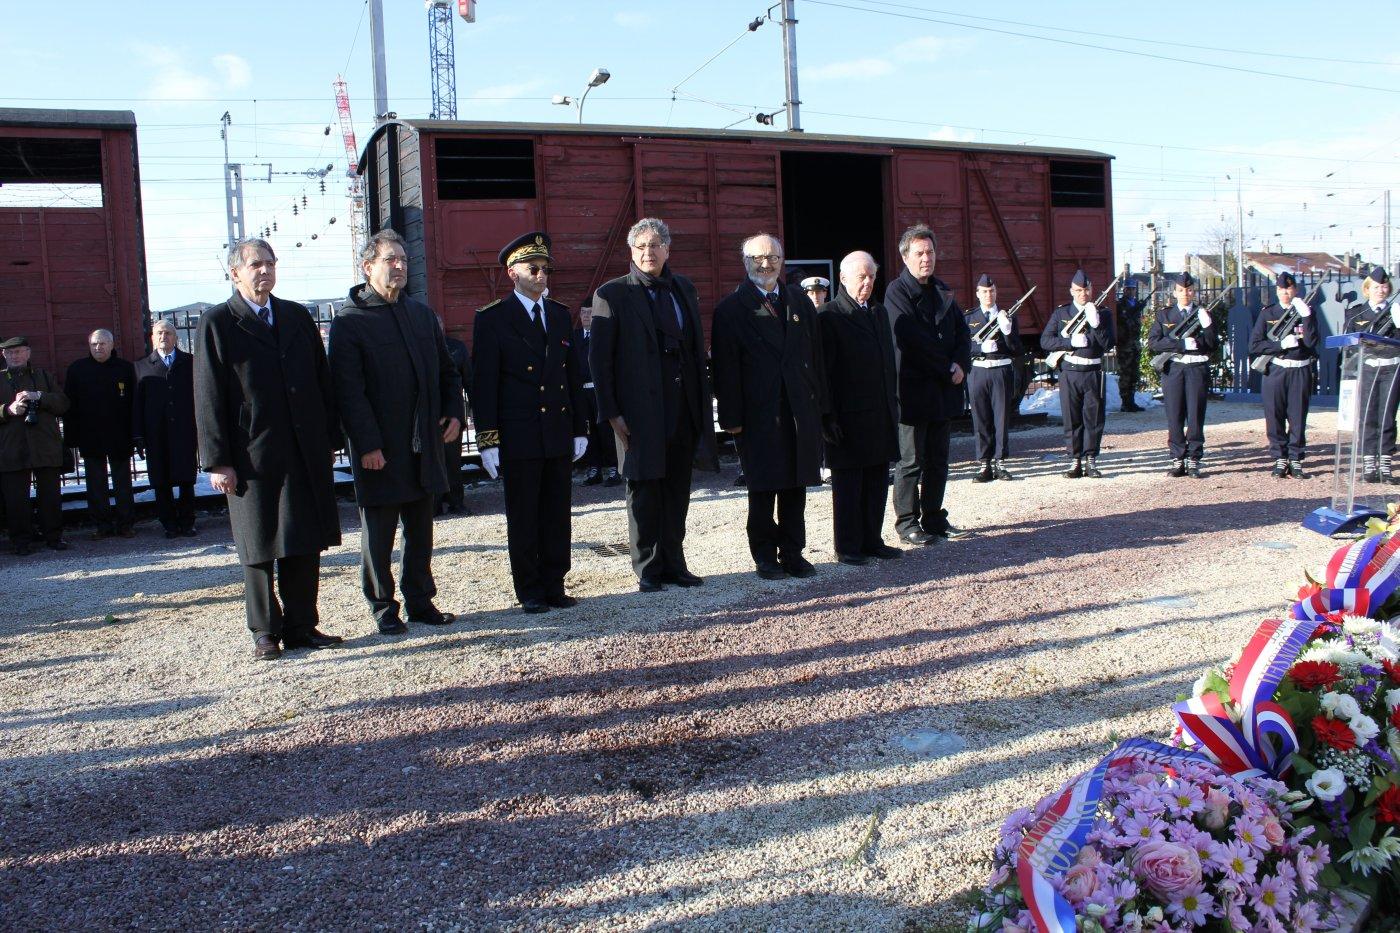 memorial-du-wagon-de-deportation-fut-inaugure-14-mars-2013